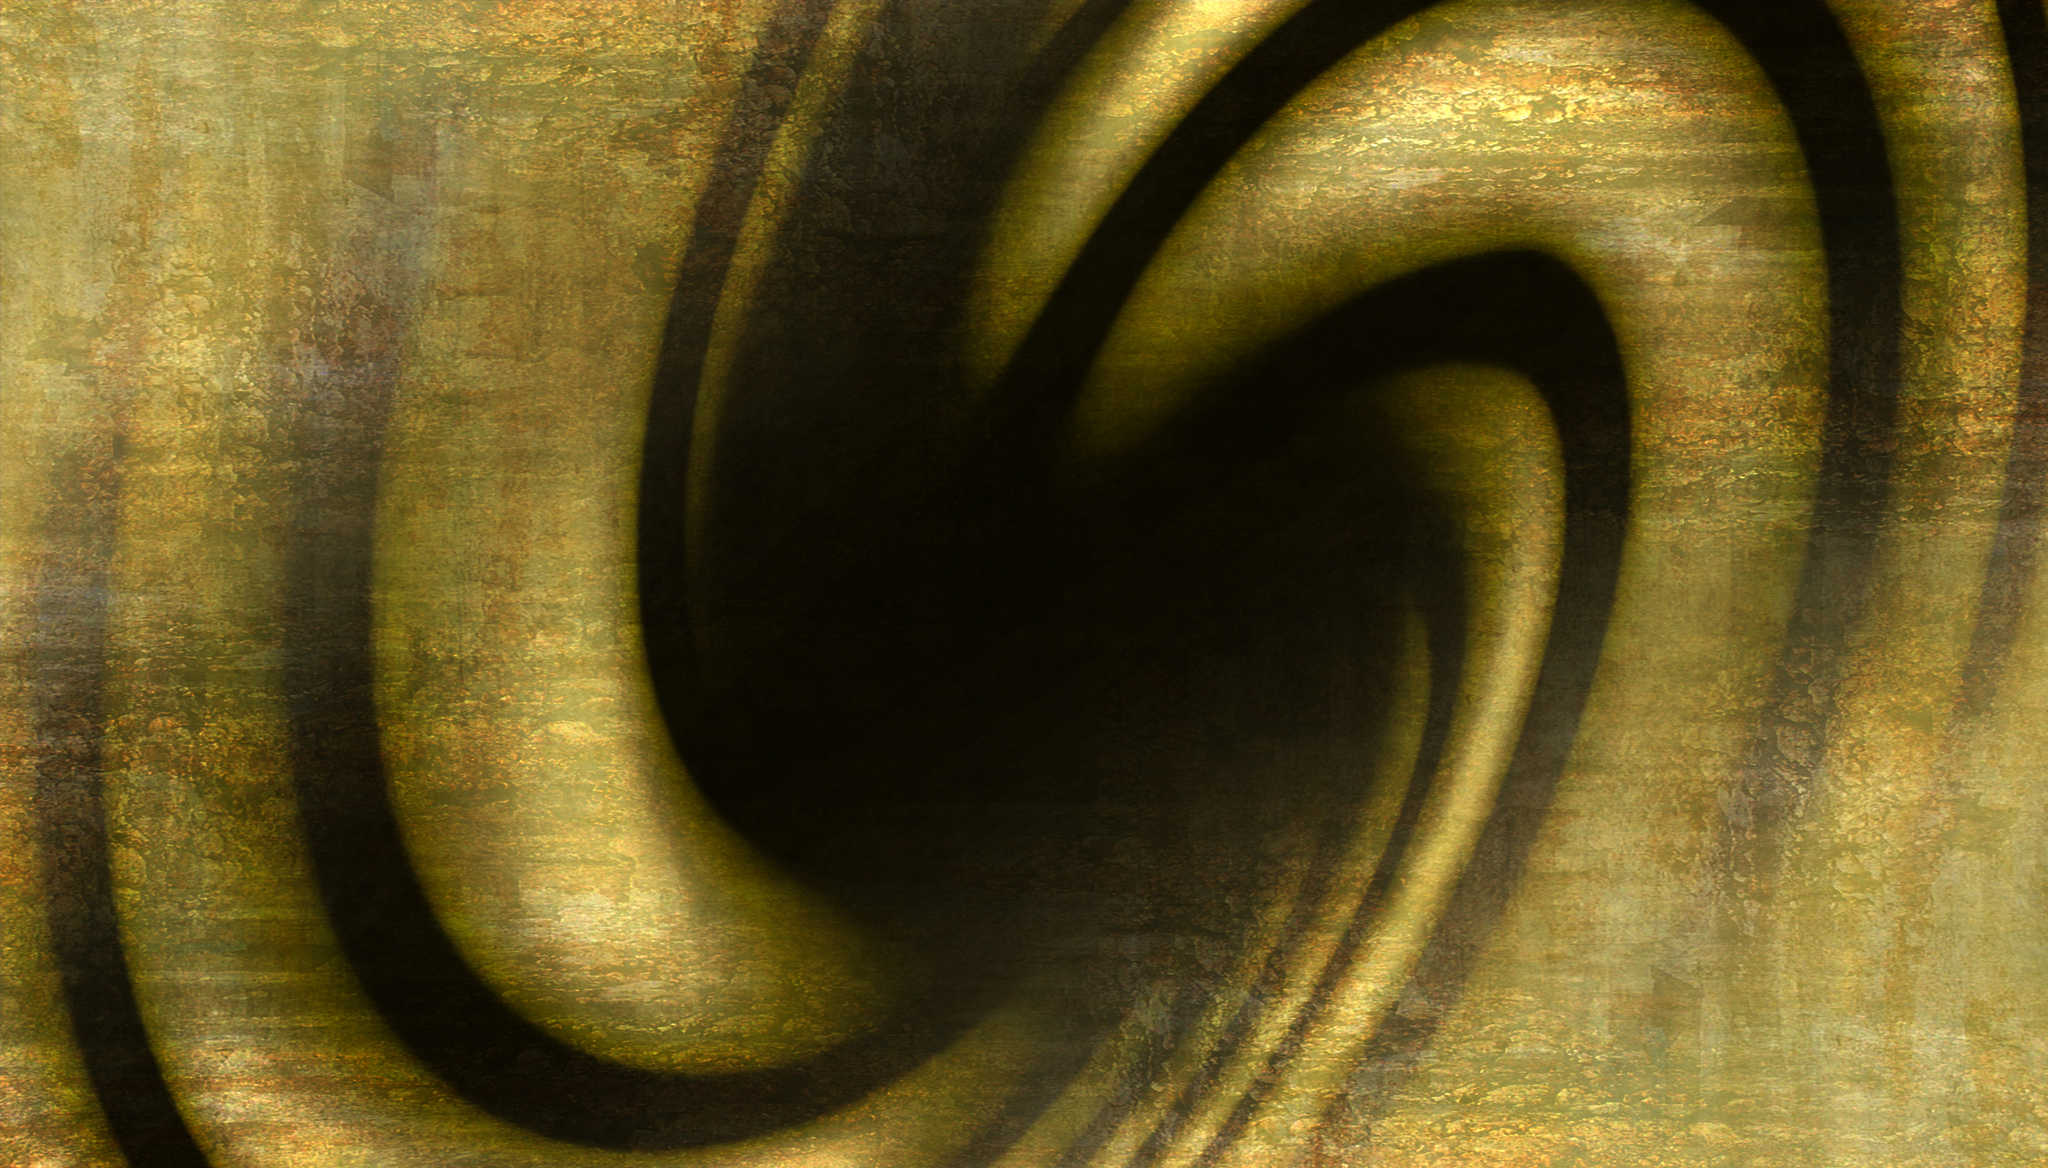 Golden Origin Green 2012